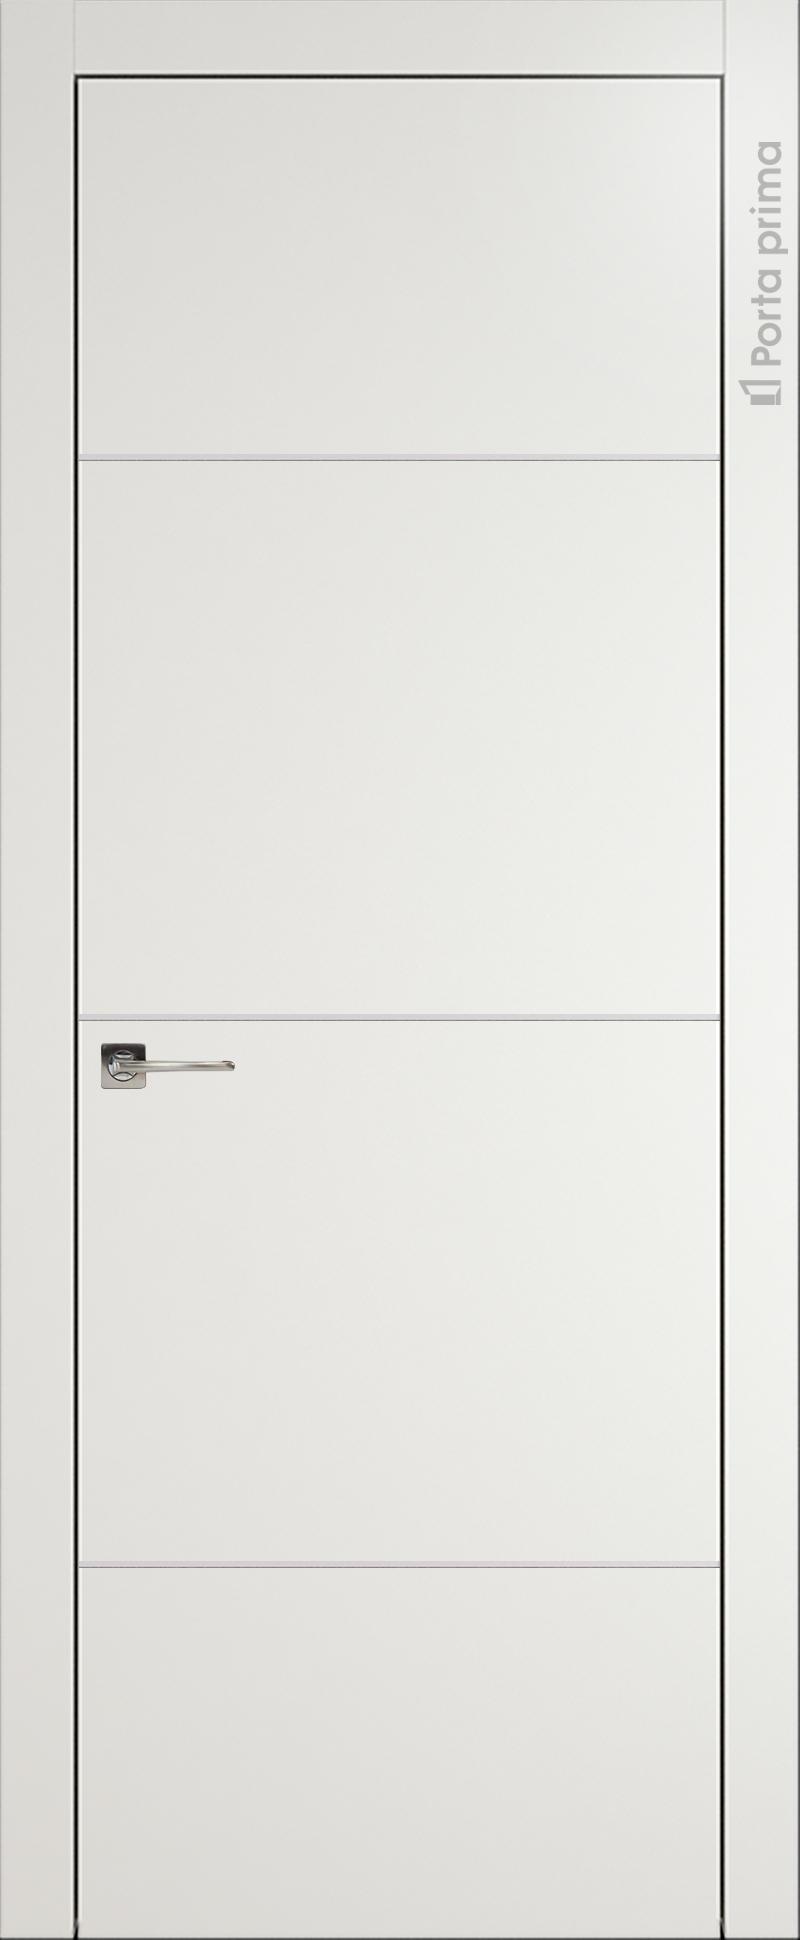 Tivoli Г-3 цвет - Бежевая эмаль (RAL 9010) Без стекла (ДГ)